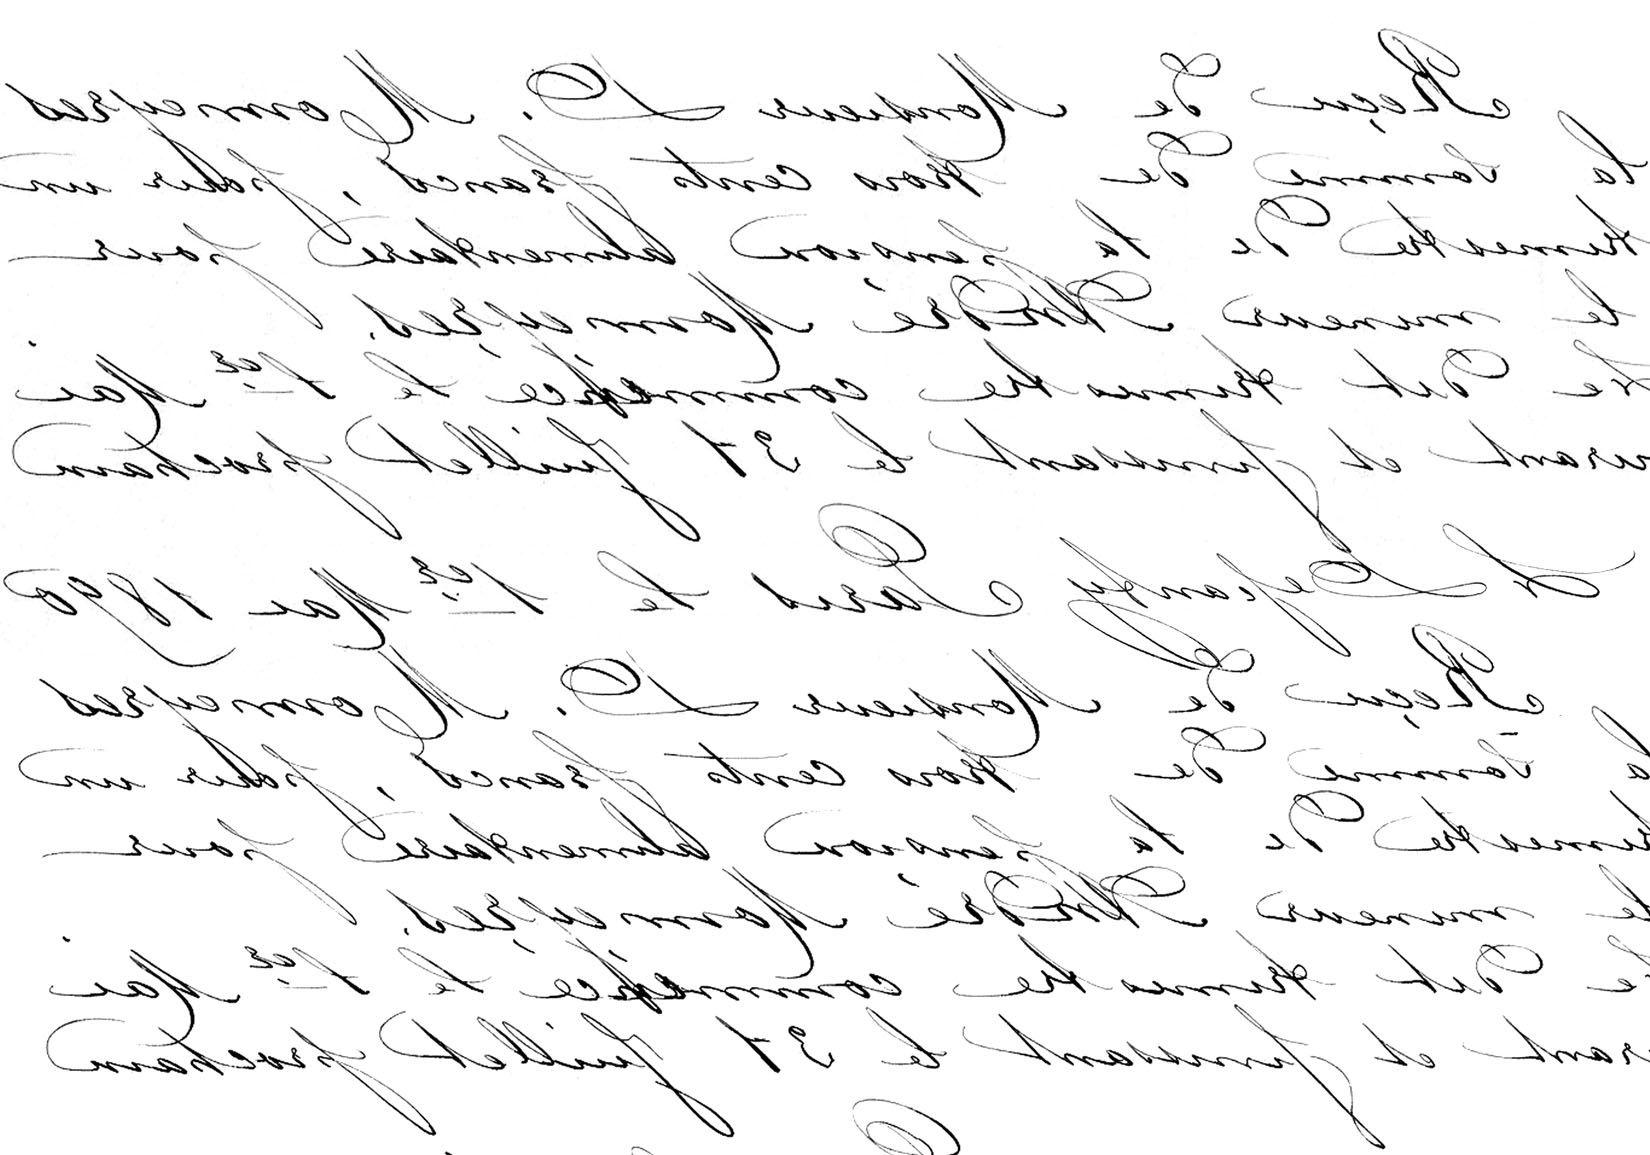 French Handwriting Transfer Printable